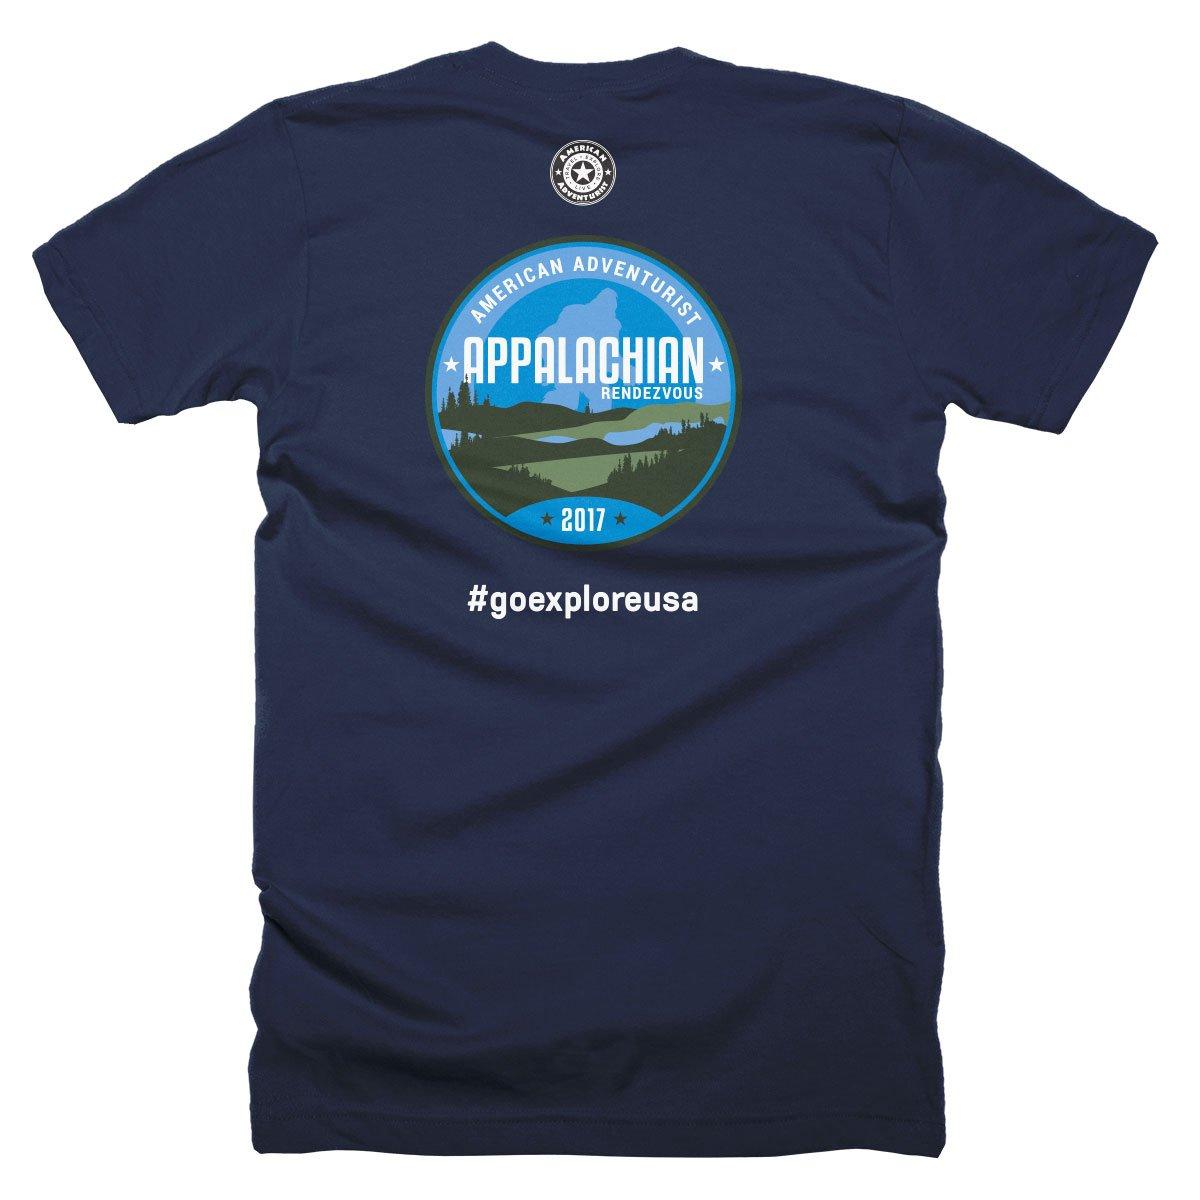 Image of 2017 Appalachian Rendezvous T-Shirt